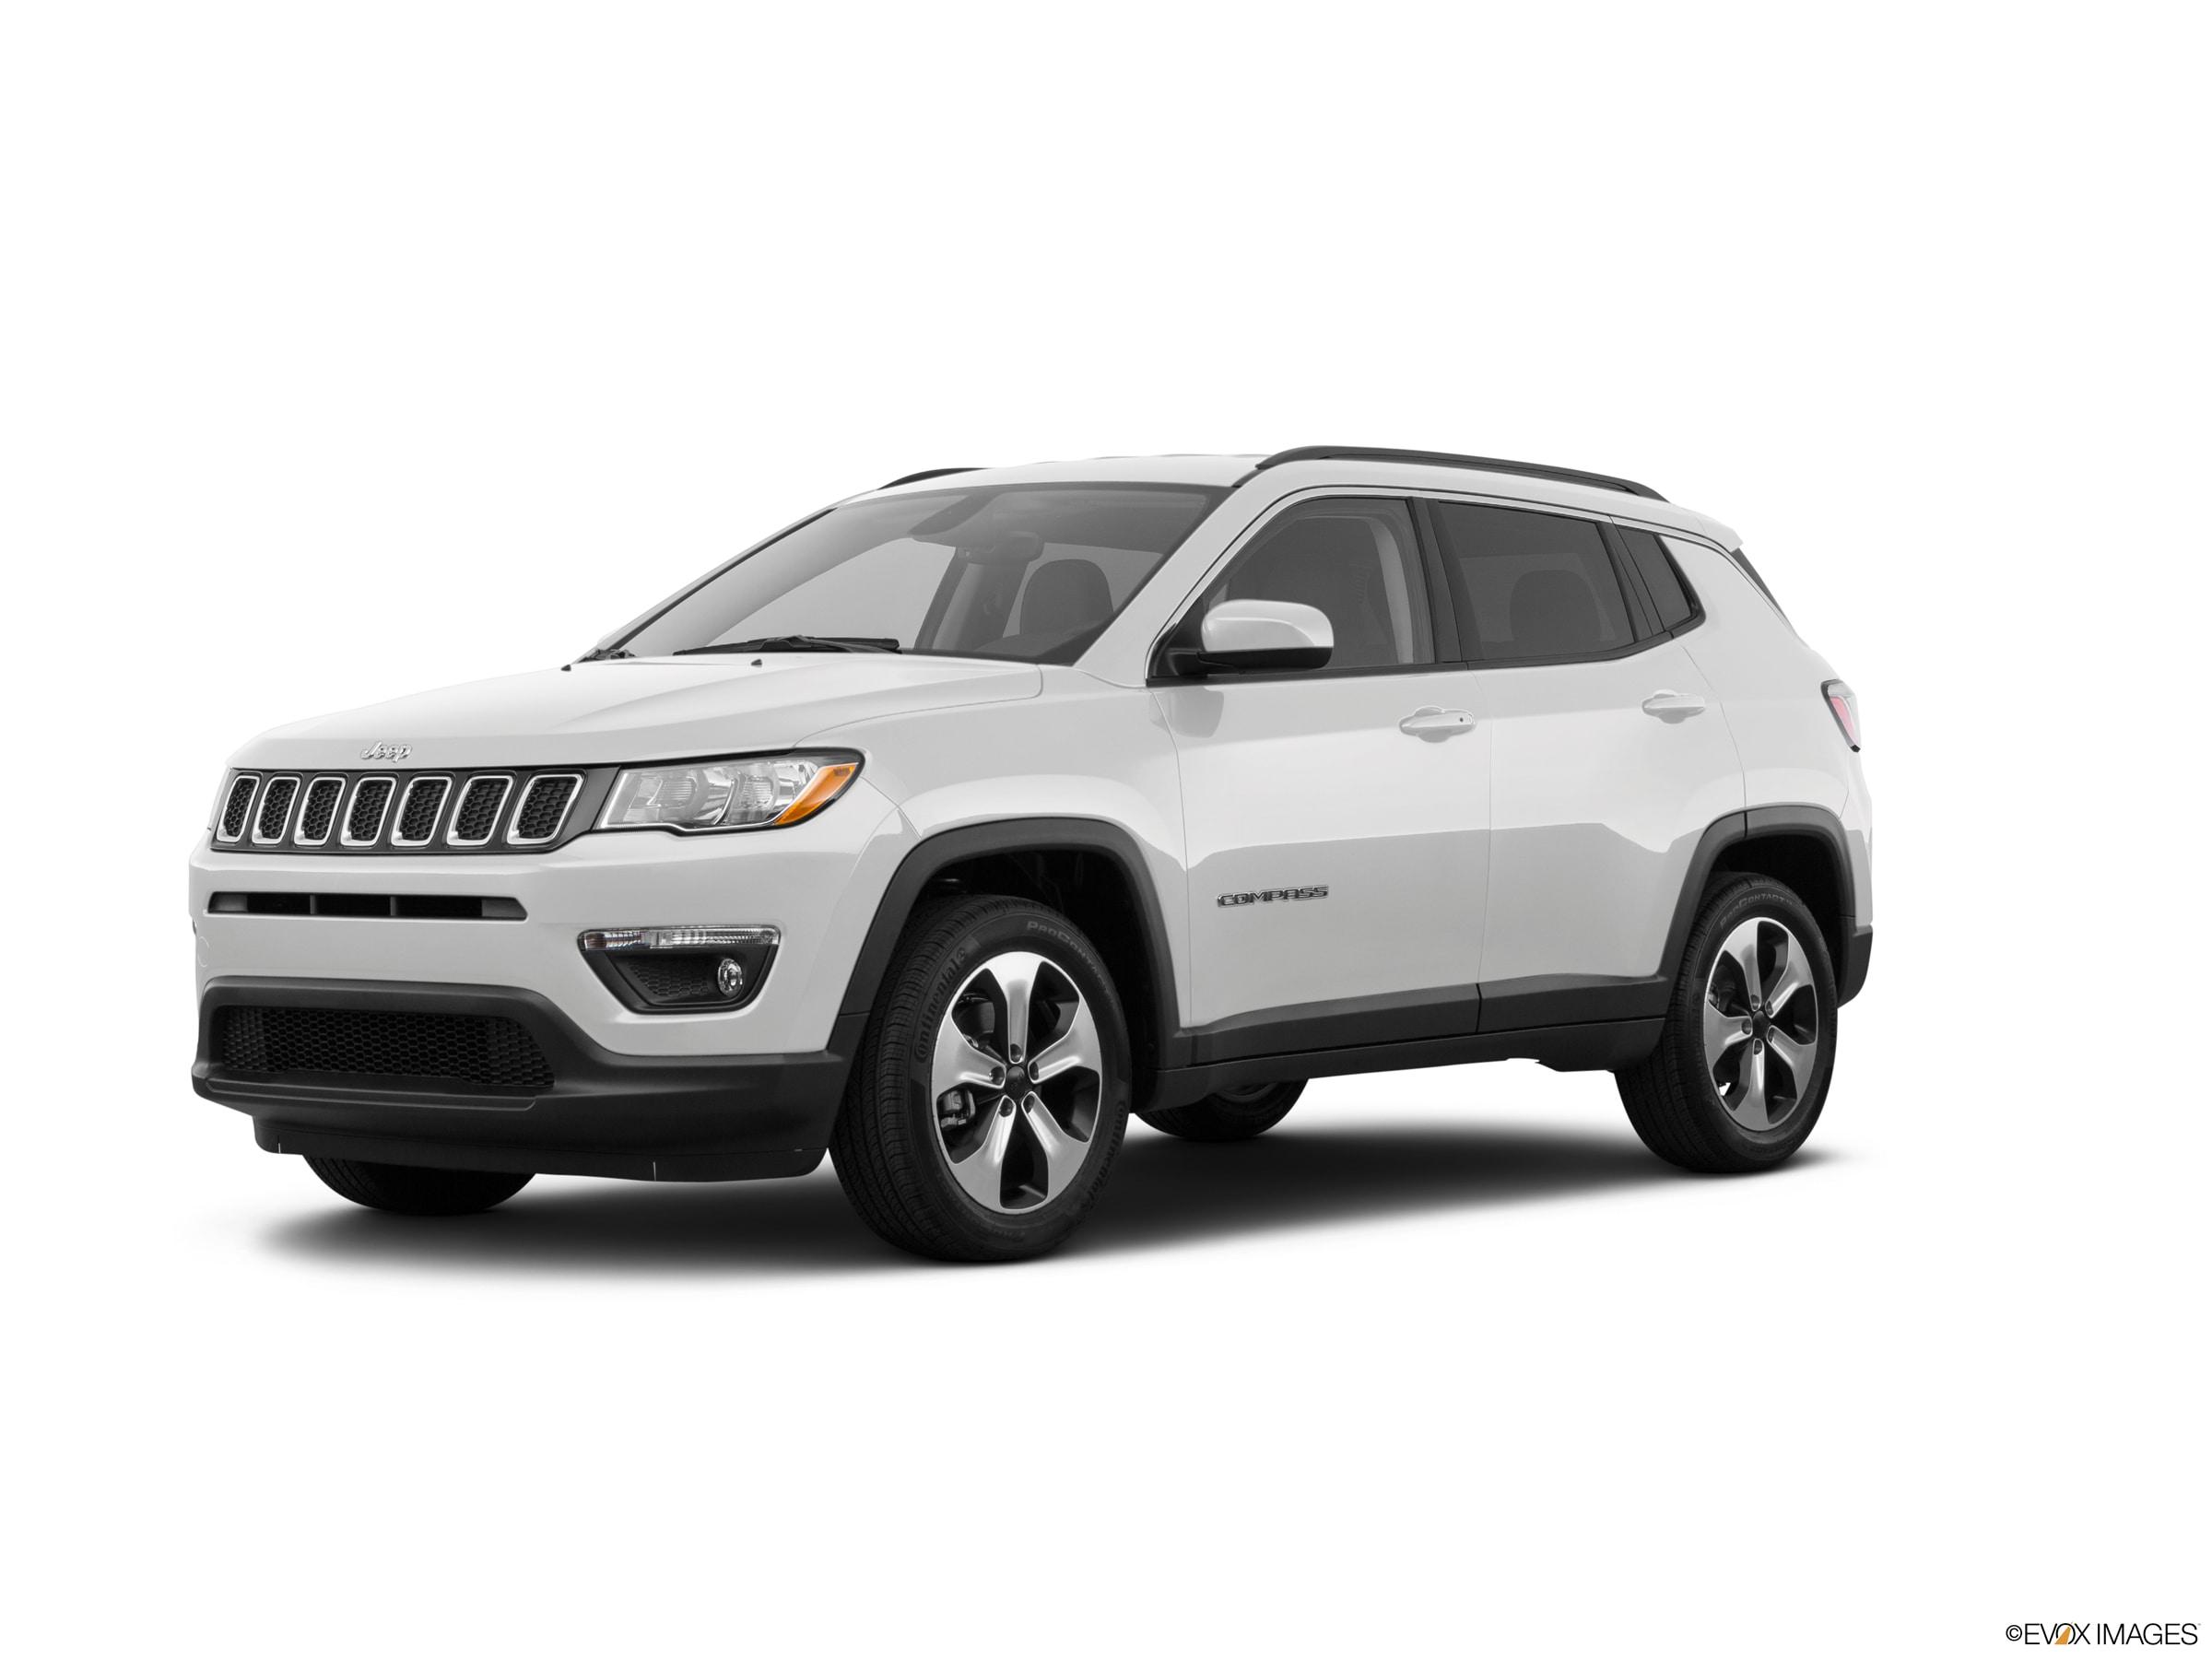 2018 Jeep Compass SUV Sport Utility 4WD